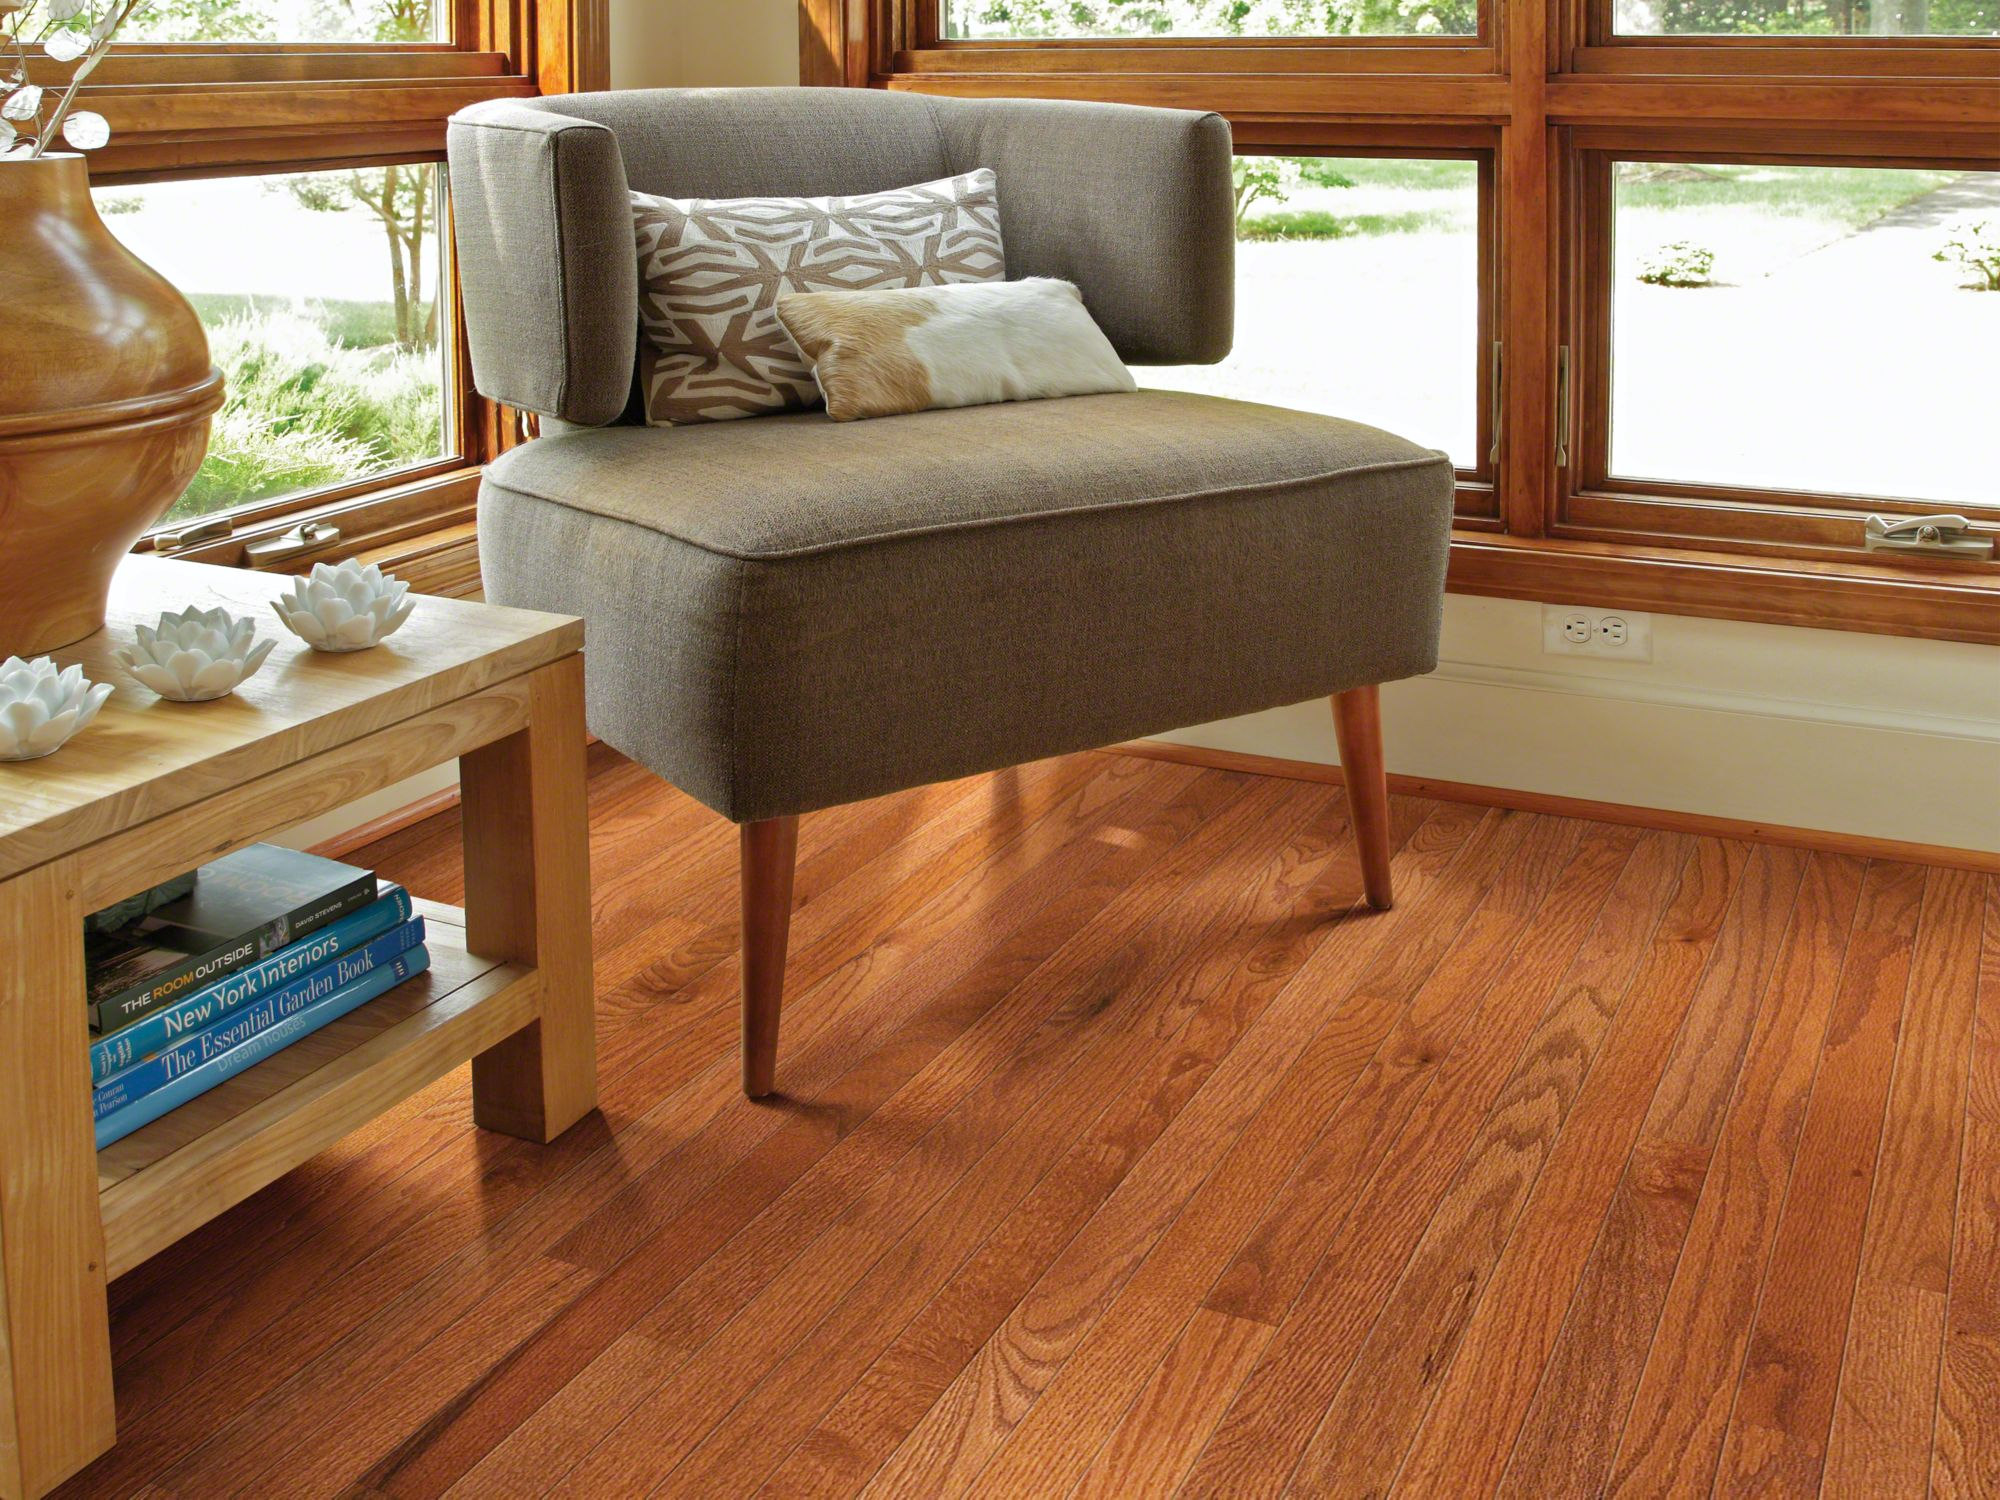 shaw wood flooring golden opportunity 2 1/4 OFMRTKA